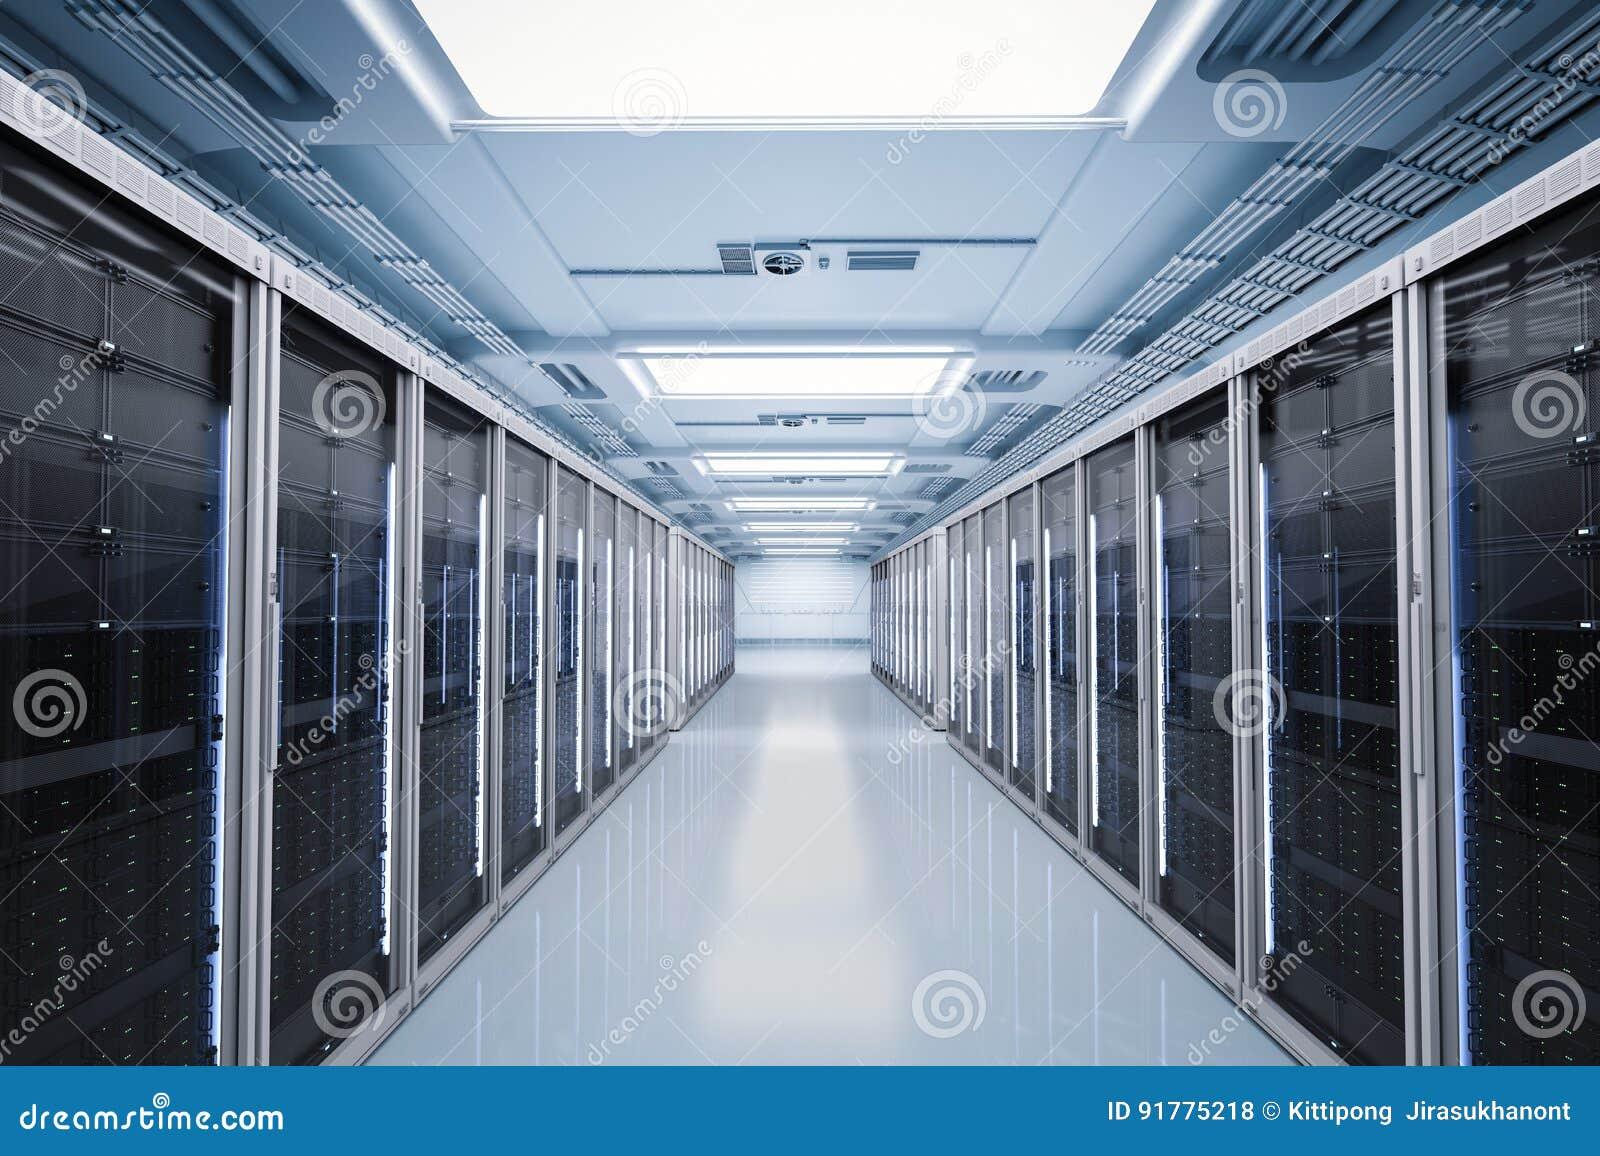 Комната или компьютер-серверы сервера